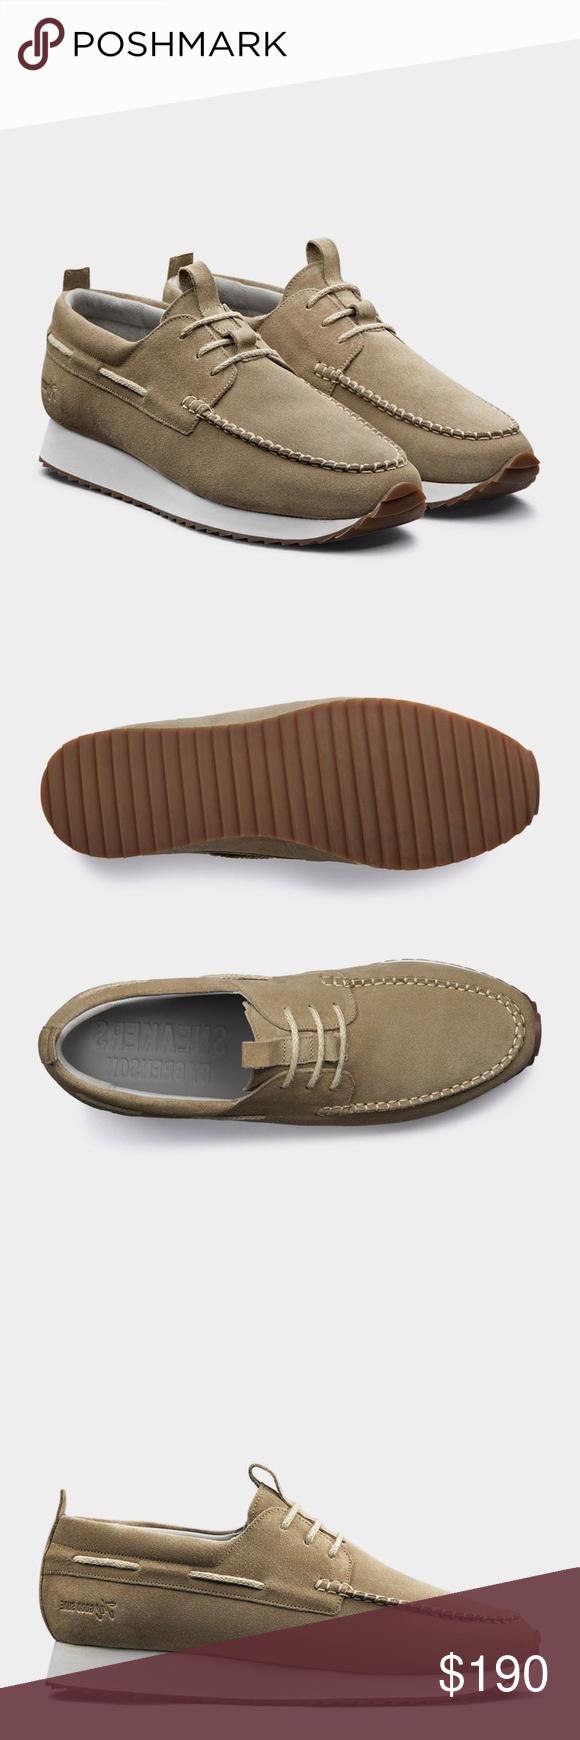 Grenson Rock 15 Sneakers | Sneakers